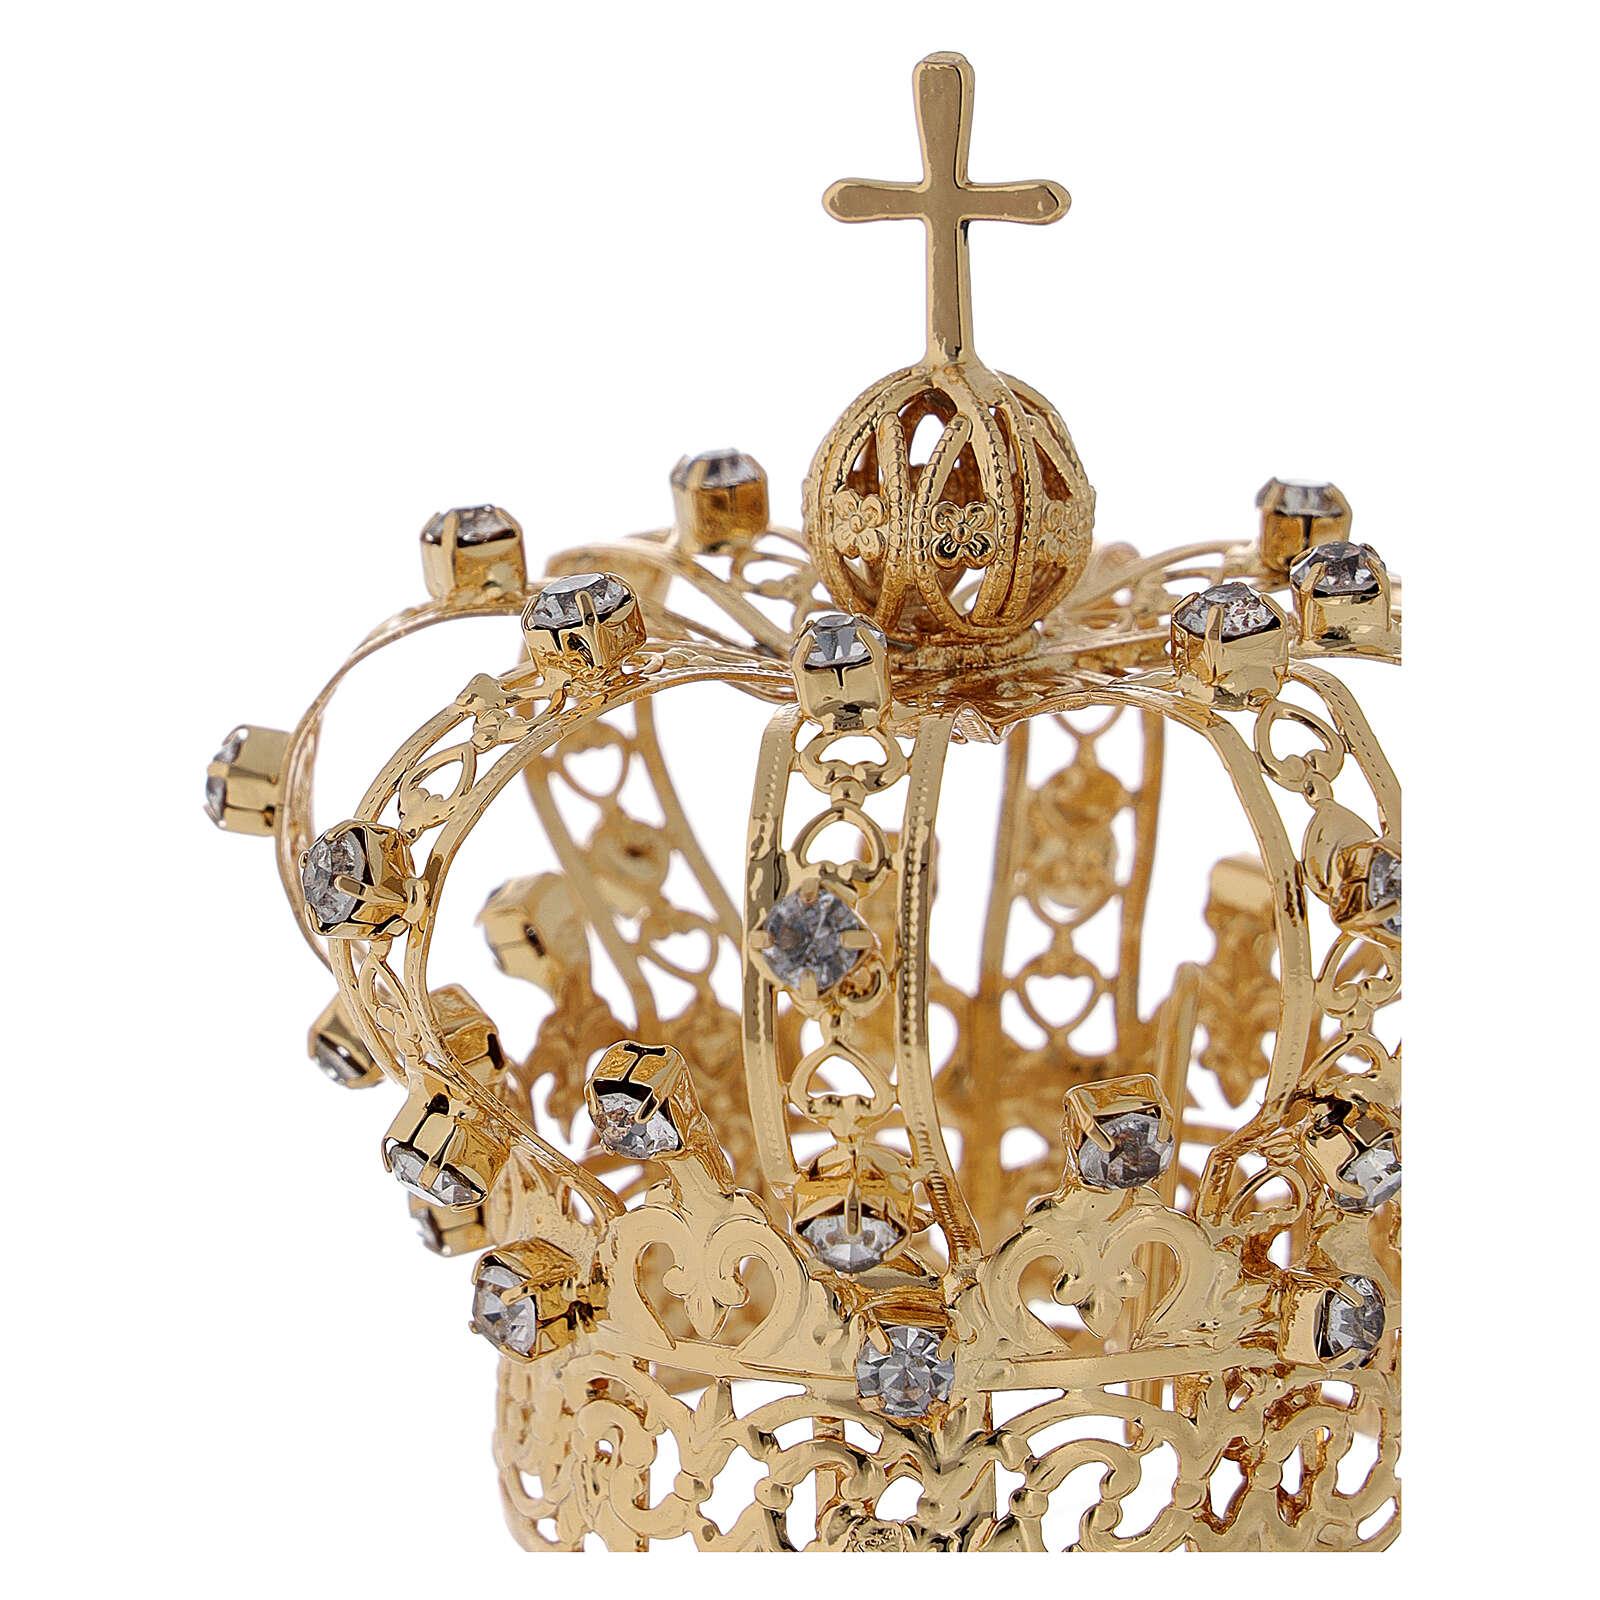 Corona Madonna croce e gemme 4 cm 3